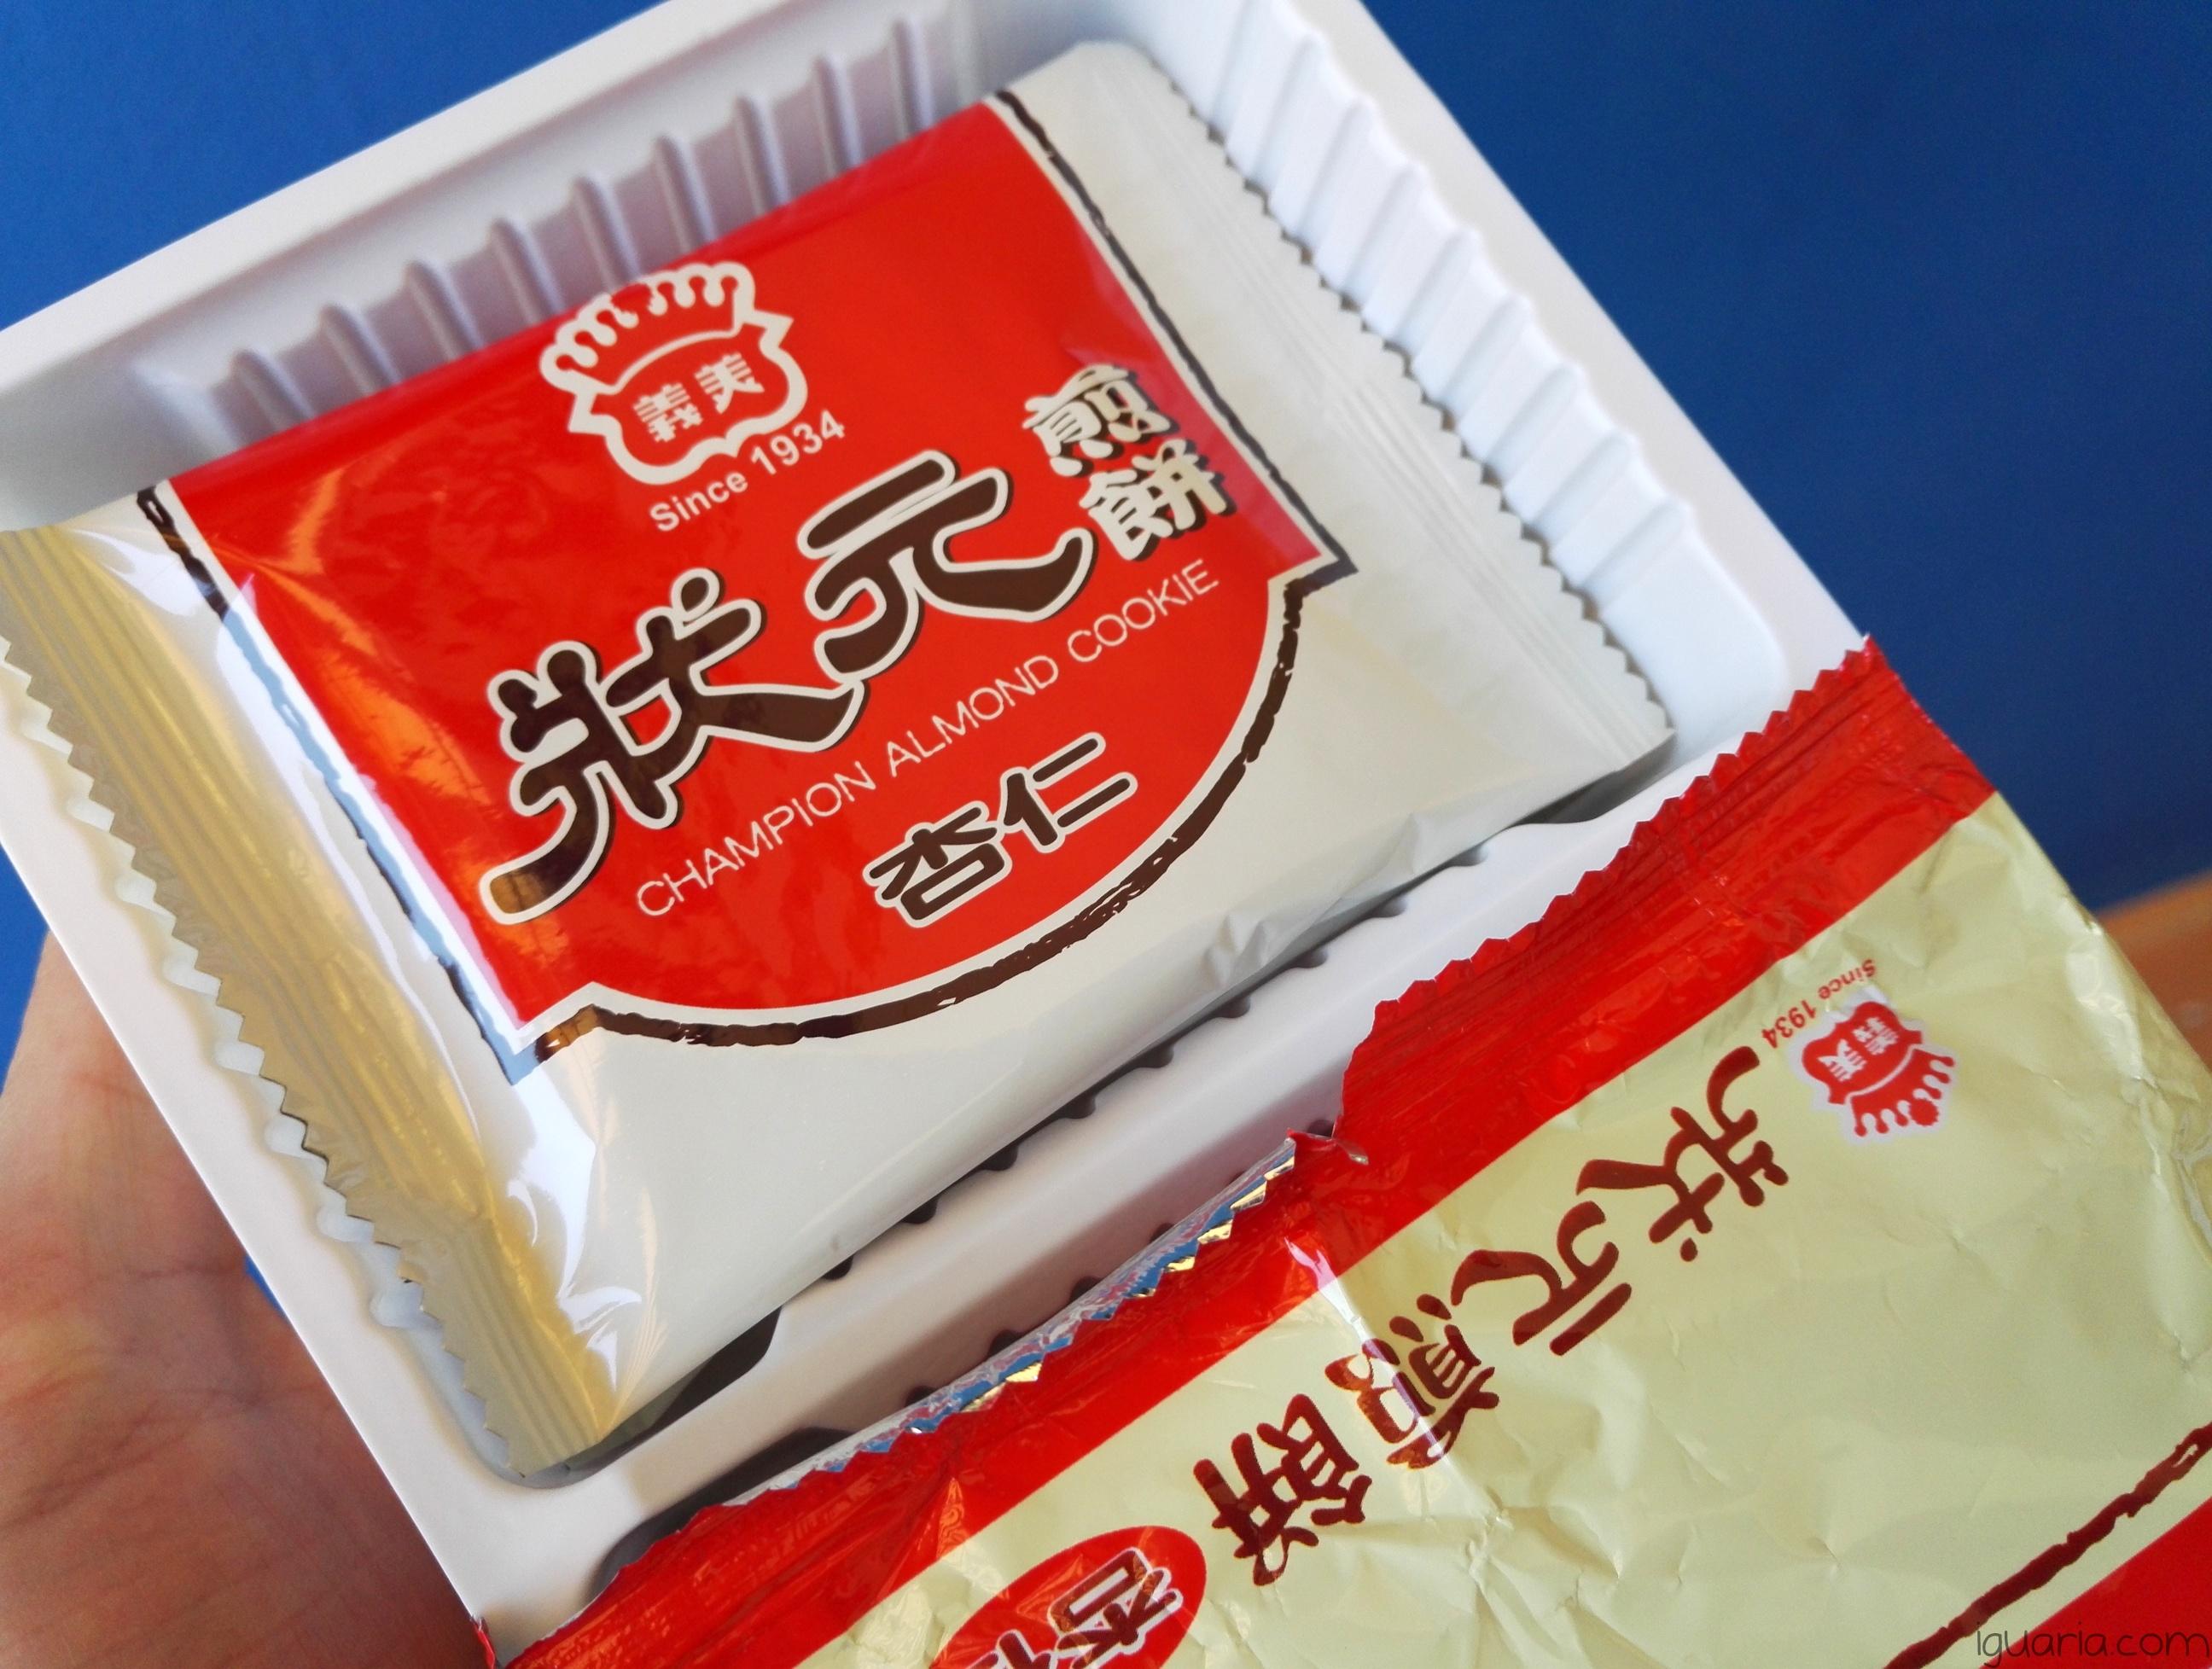 Iguaria_Pacote-Biscoito-Republica-da-China-Champion-Cookie